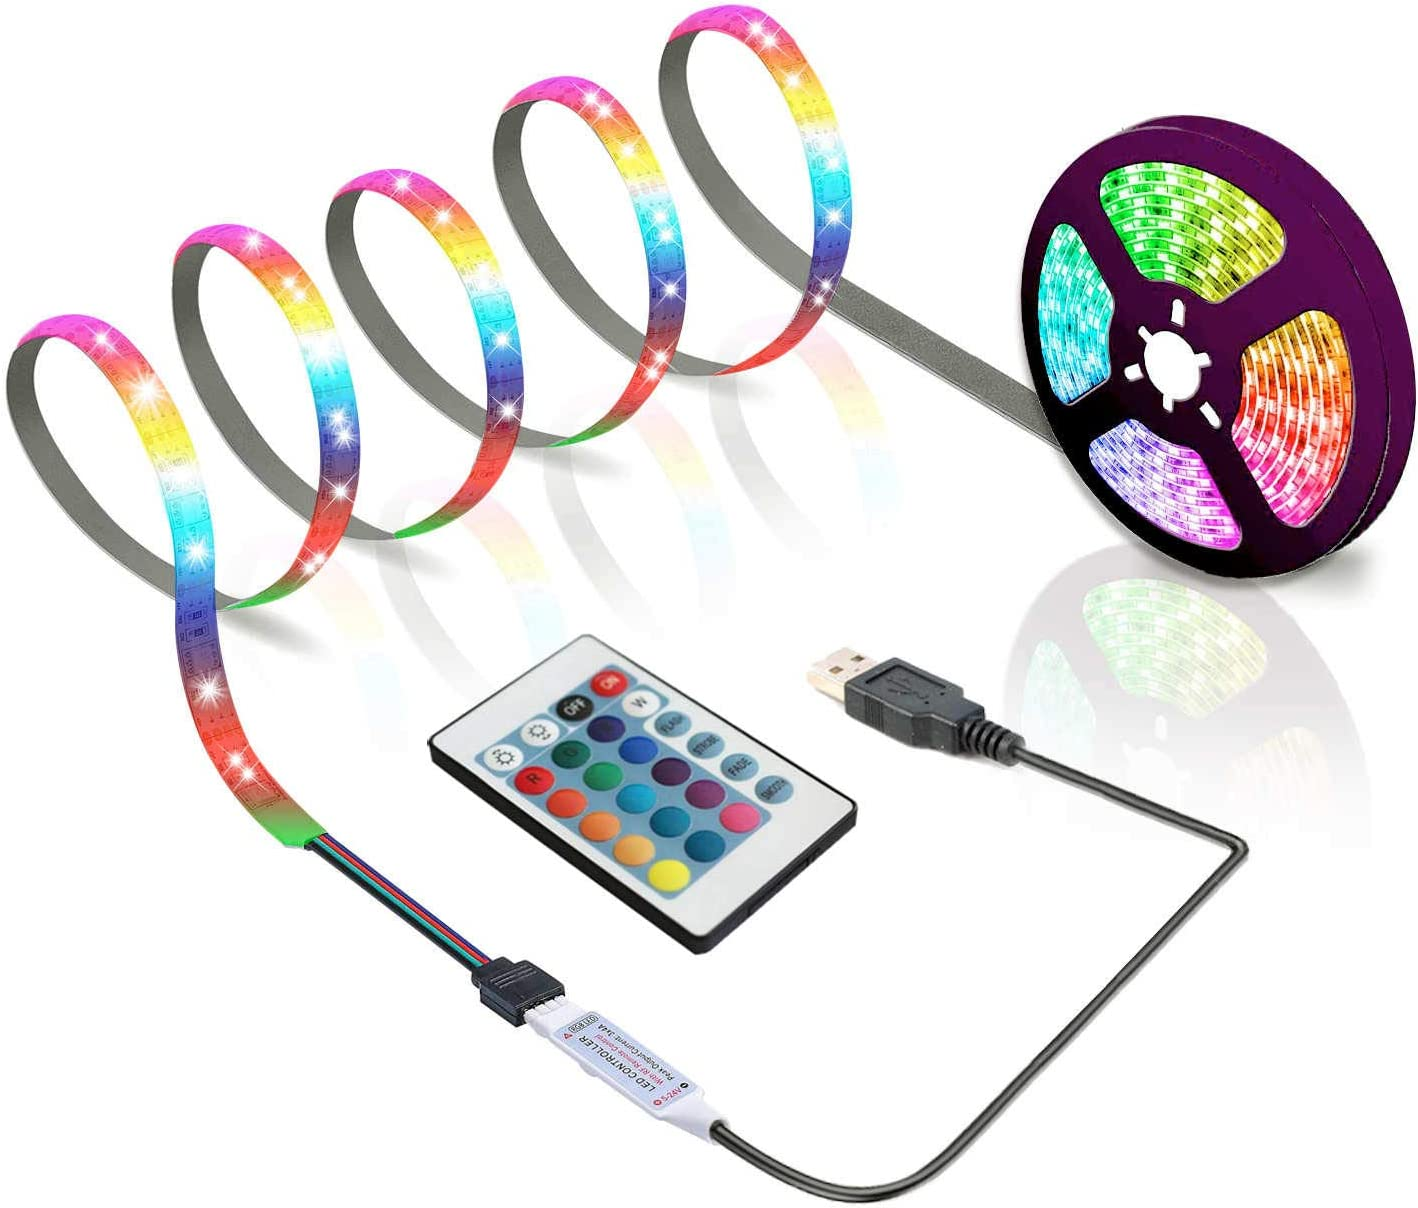 Max 71% OFF BIHAND San Diego Mall 6.56ft USB LED Strip Keys 24 with Lights Rope